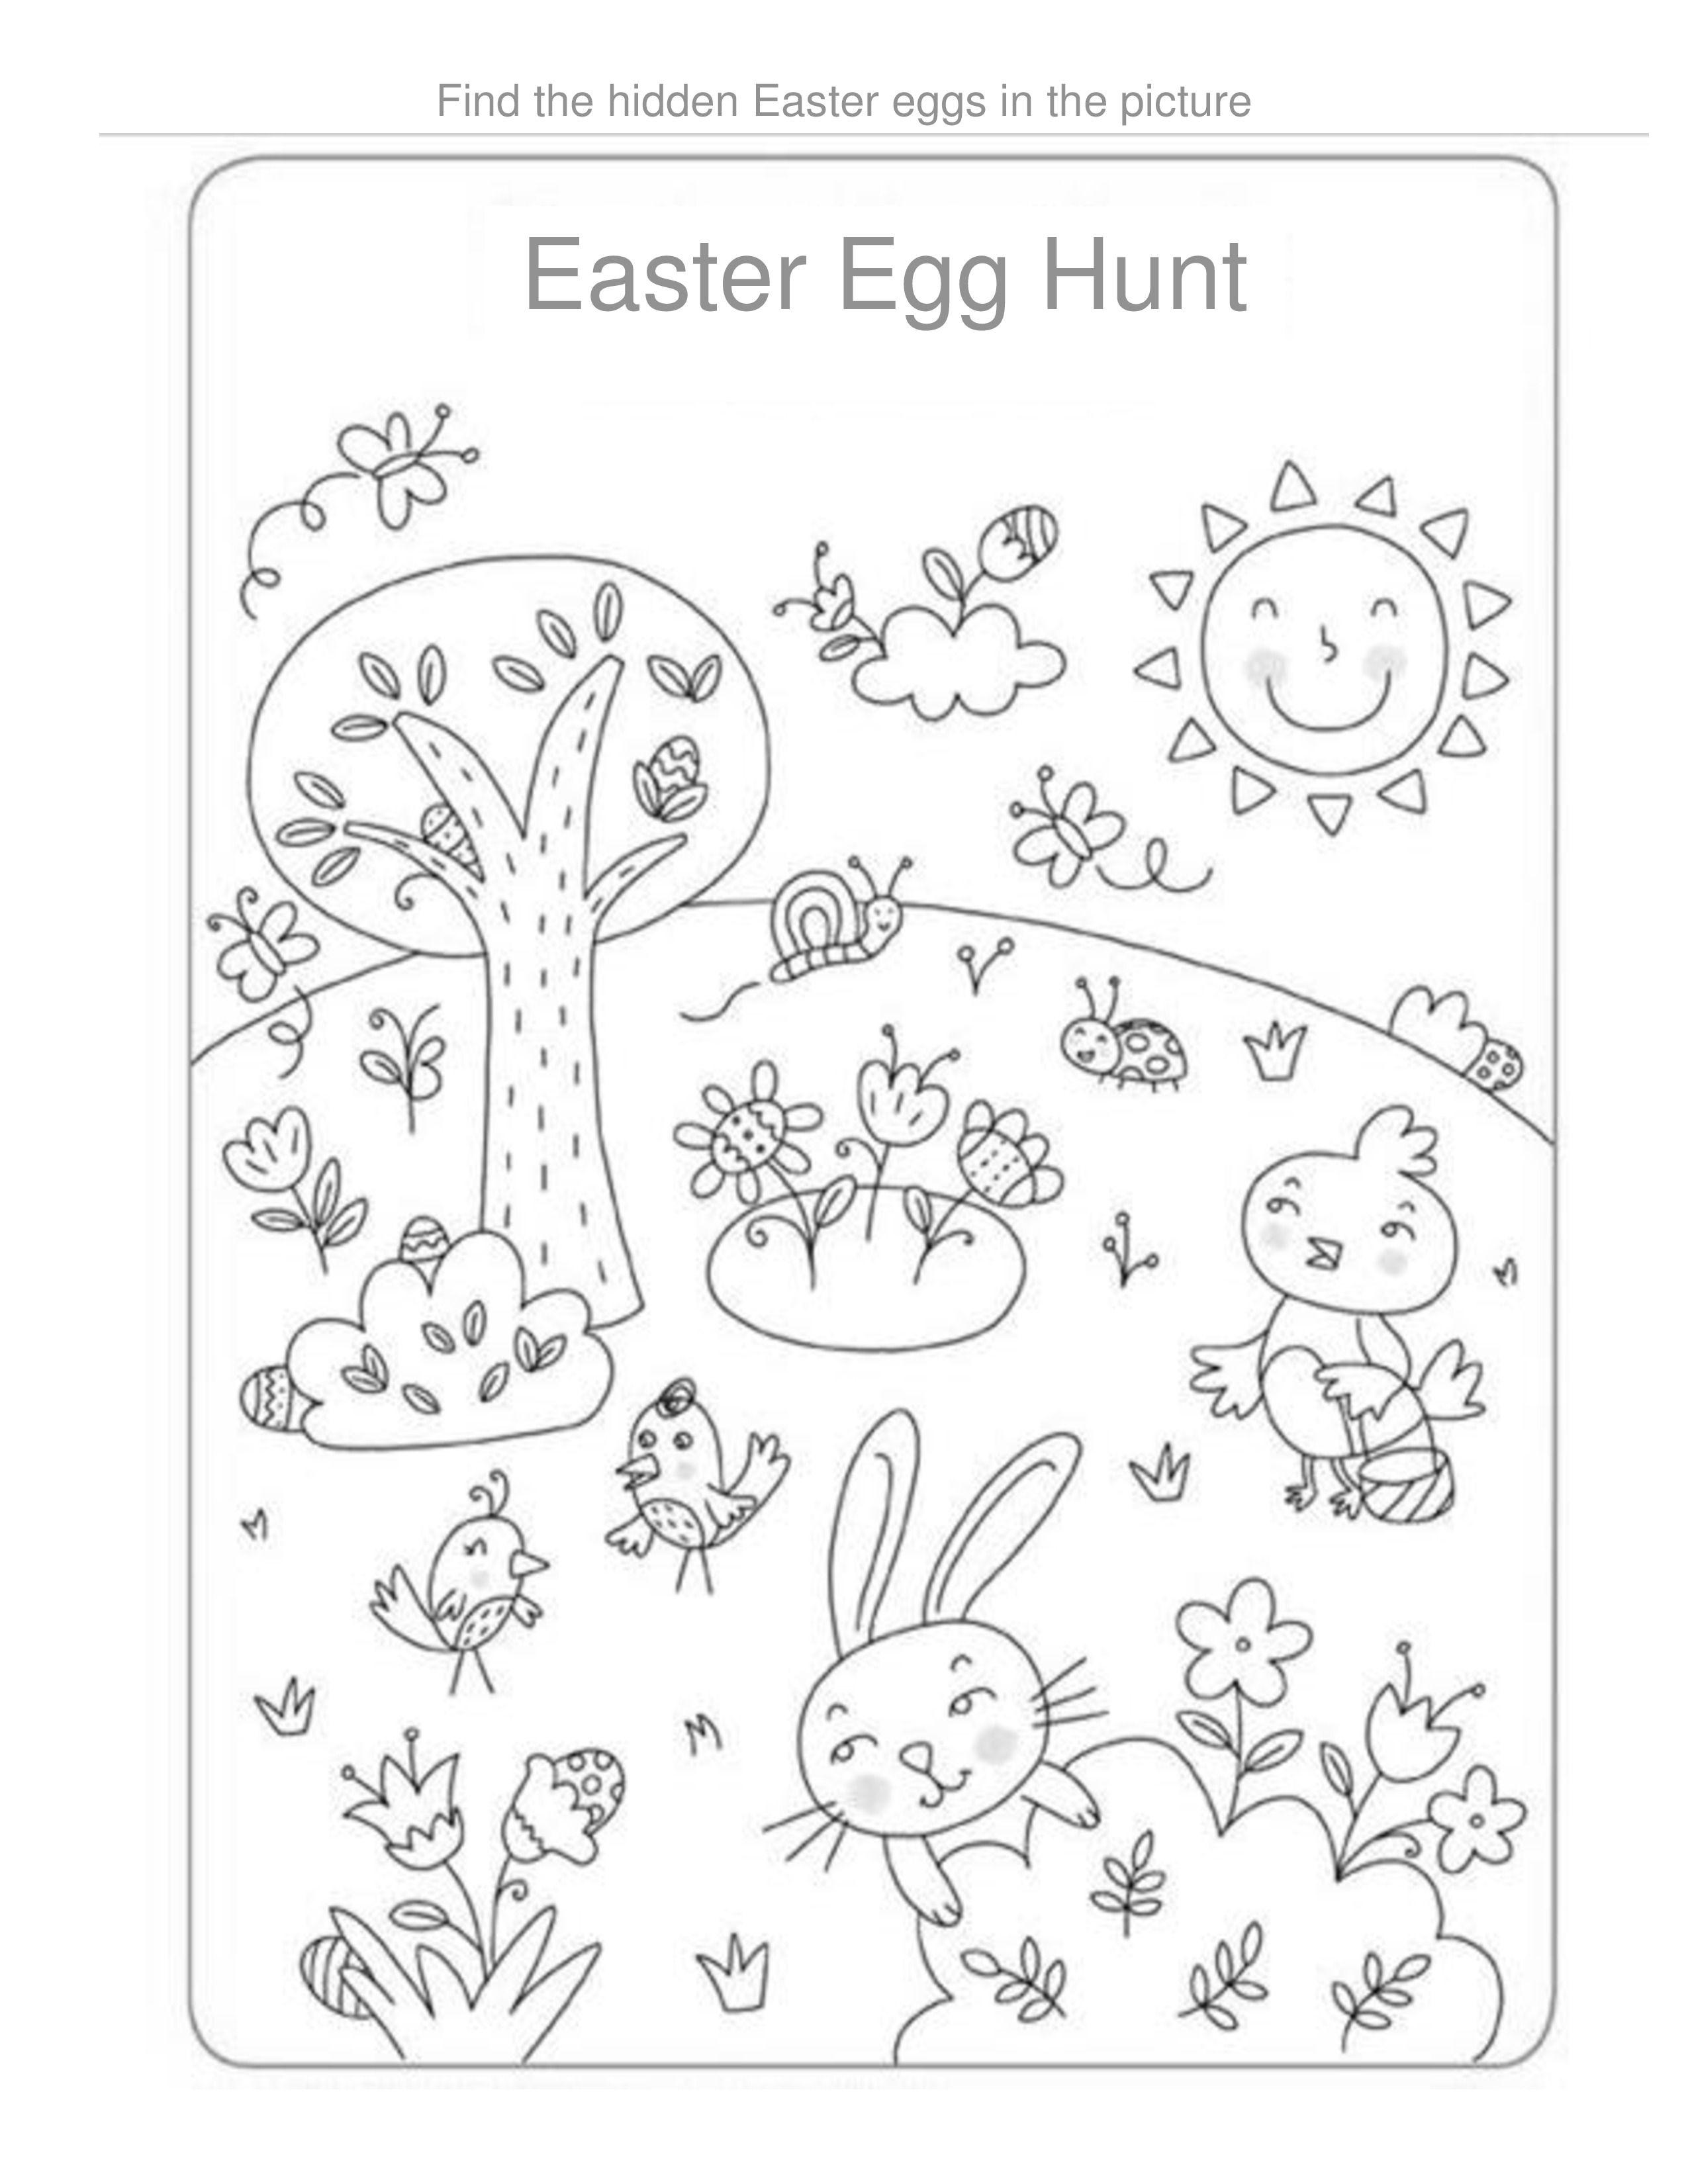 Easter Egg Hunt In 2020 Easter Activities For Kids Easter Coloring Pages Easter Kindergarten